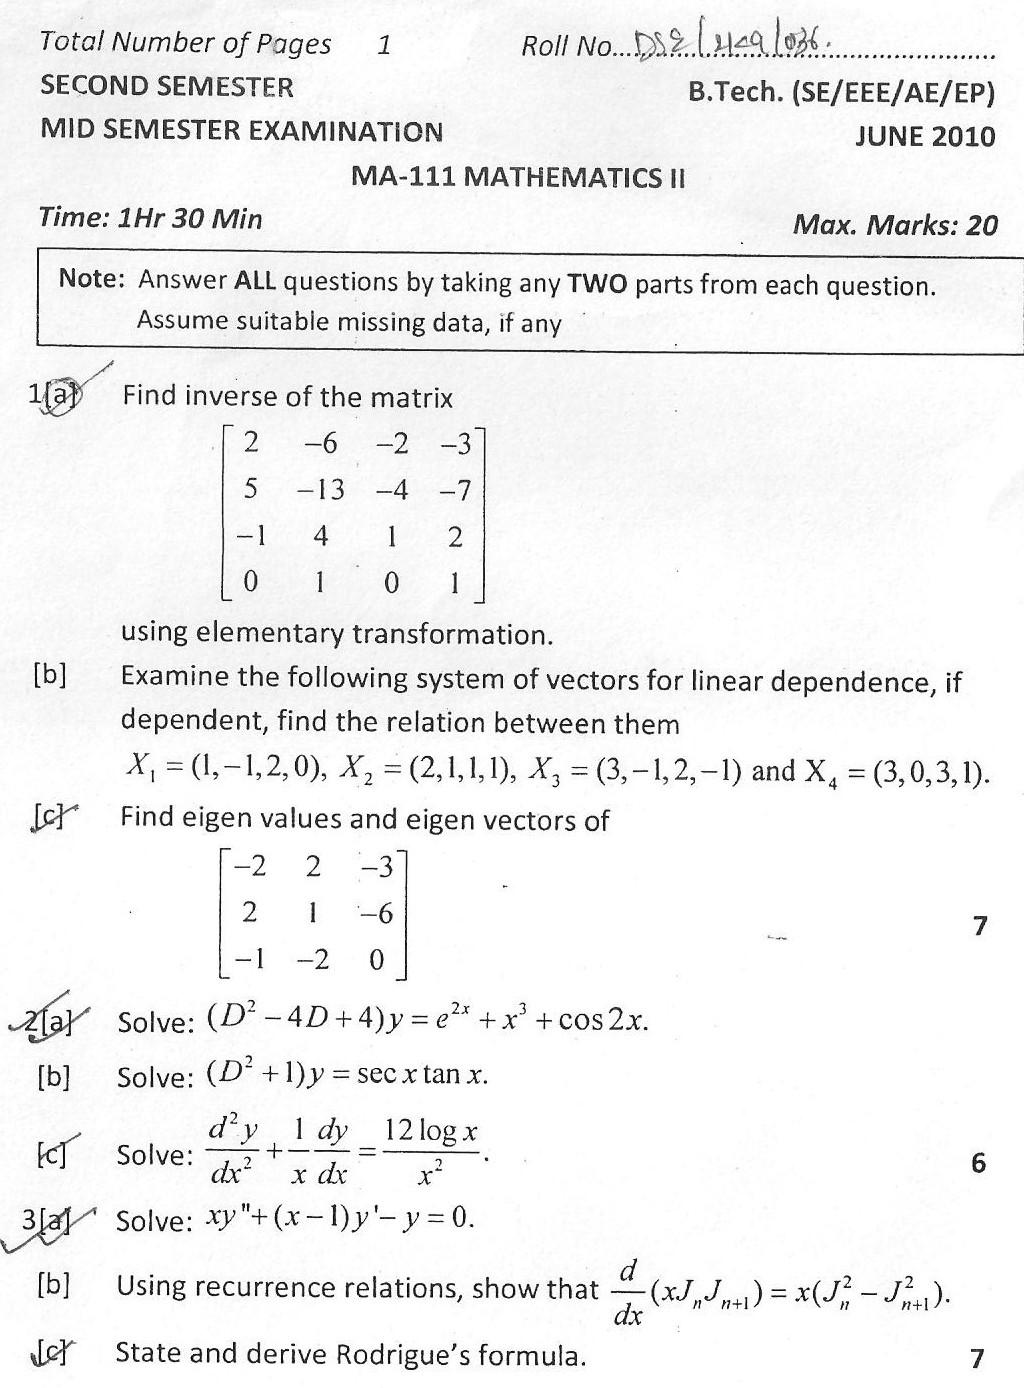 DTU Question Papers 2010 – 2 Semester - Mid Sem - MA-111